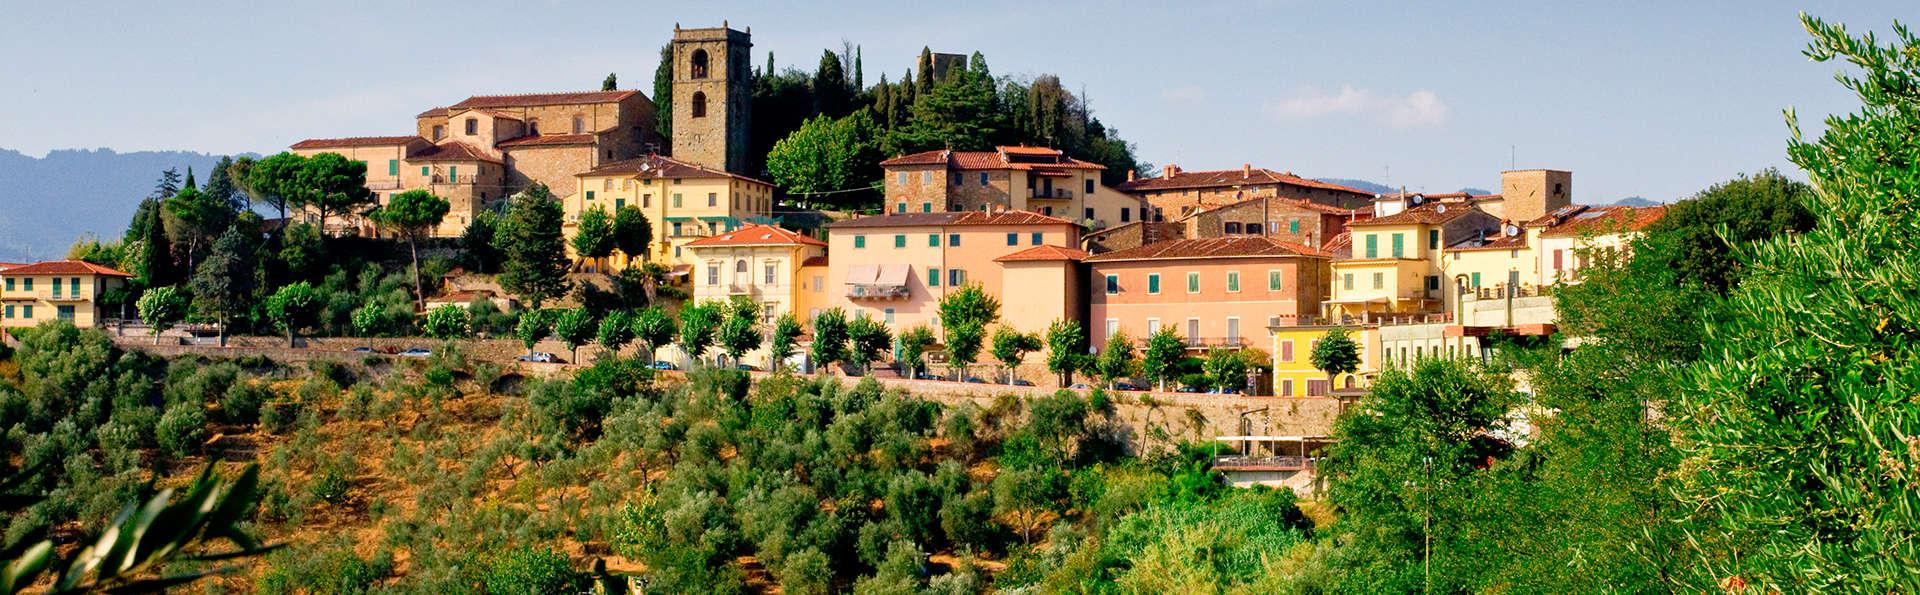 Grand Hotel Tamerici&Principe - edit_montecatini1.jpg